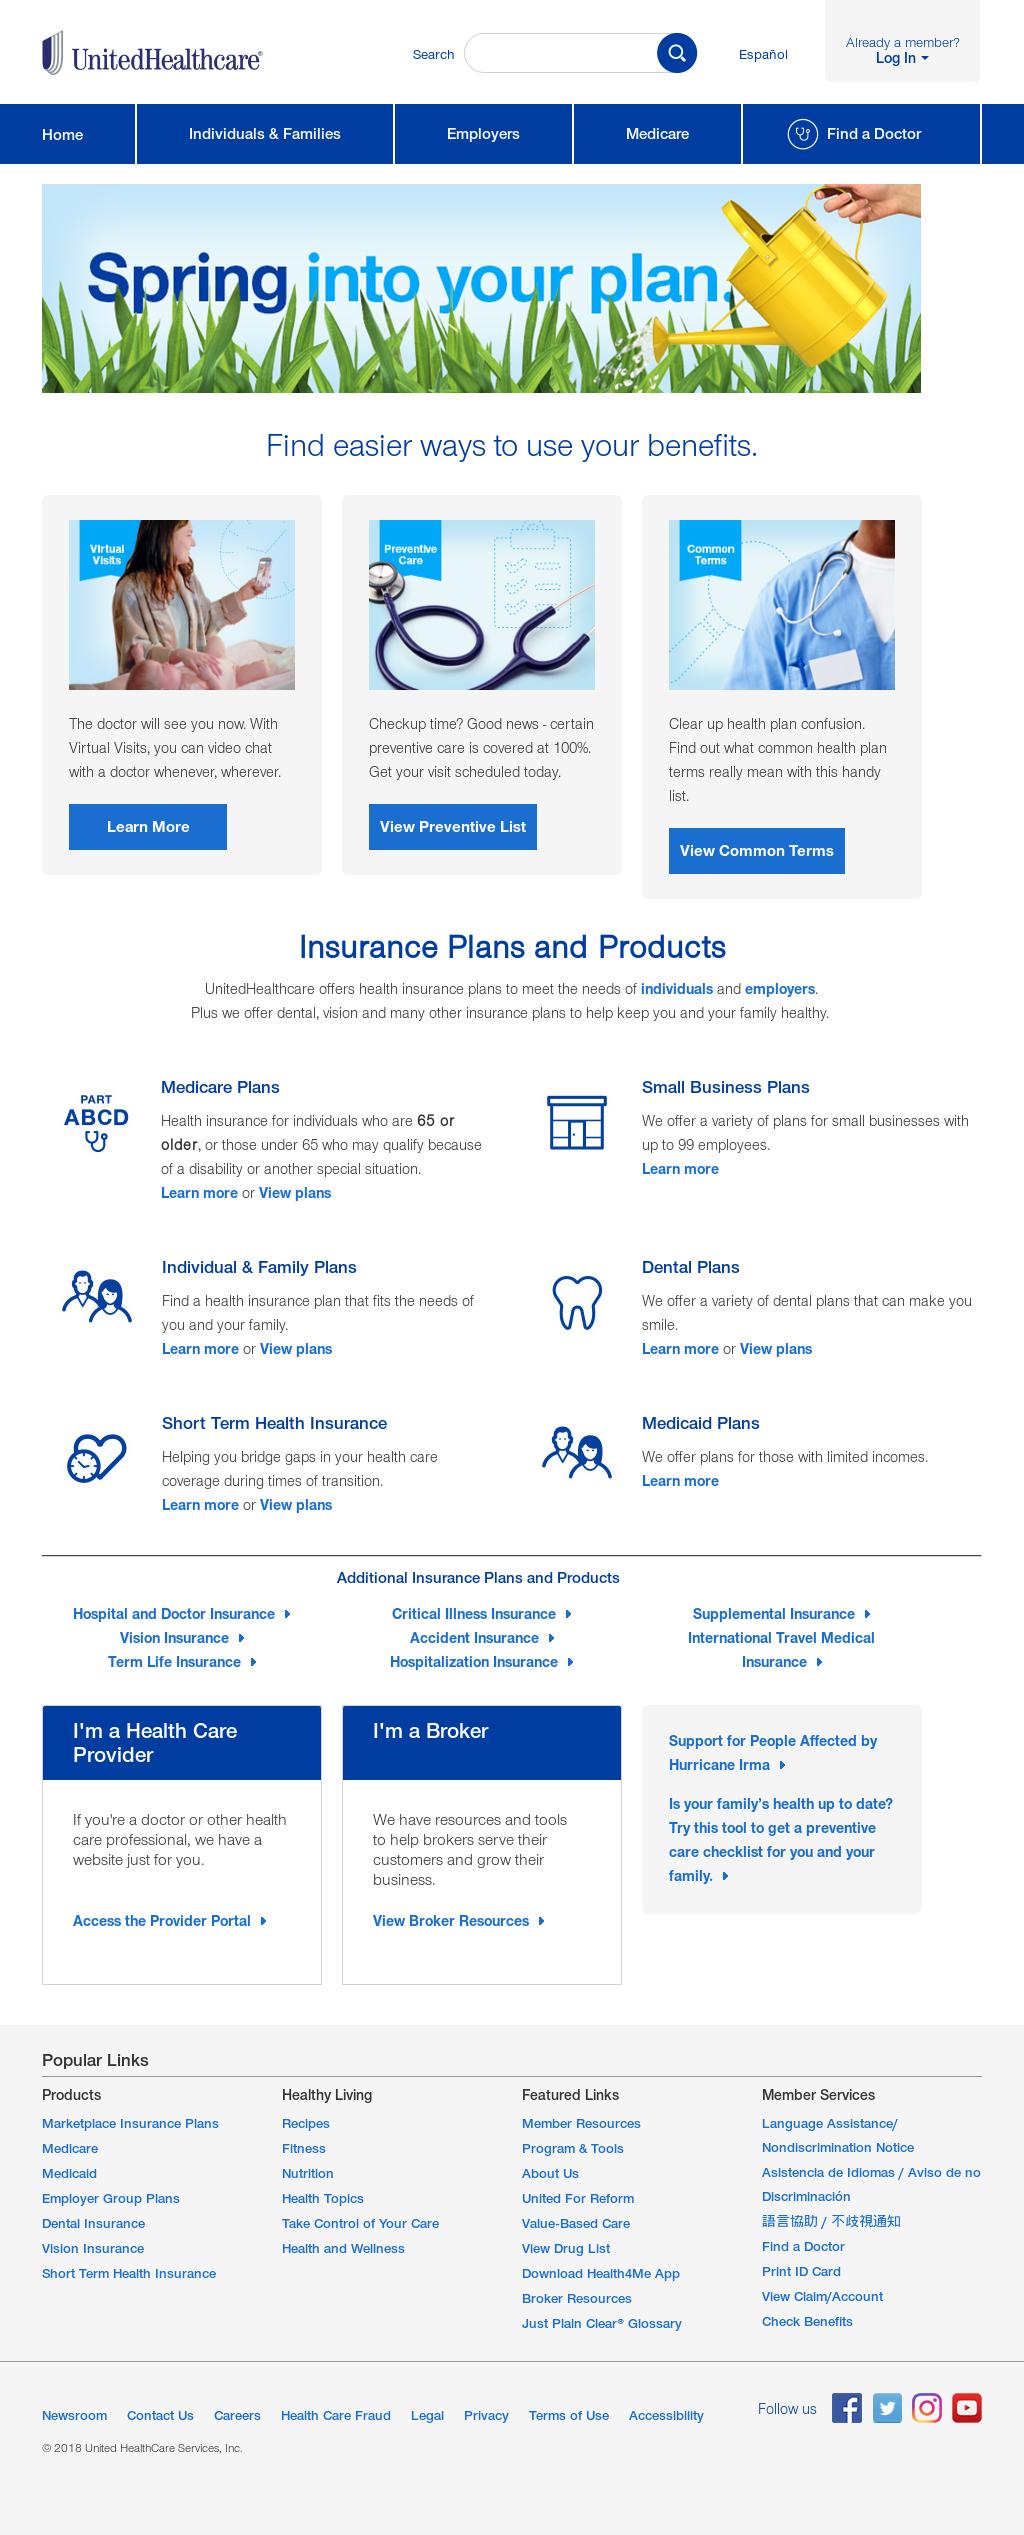 United healthcare dental web portal